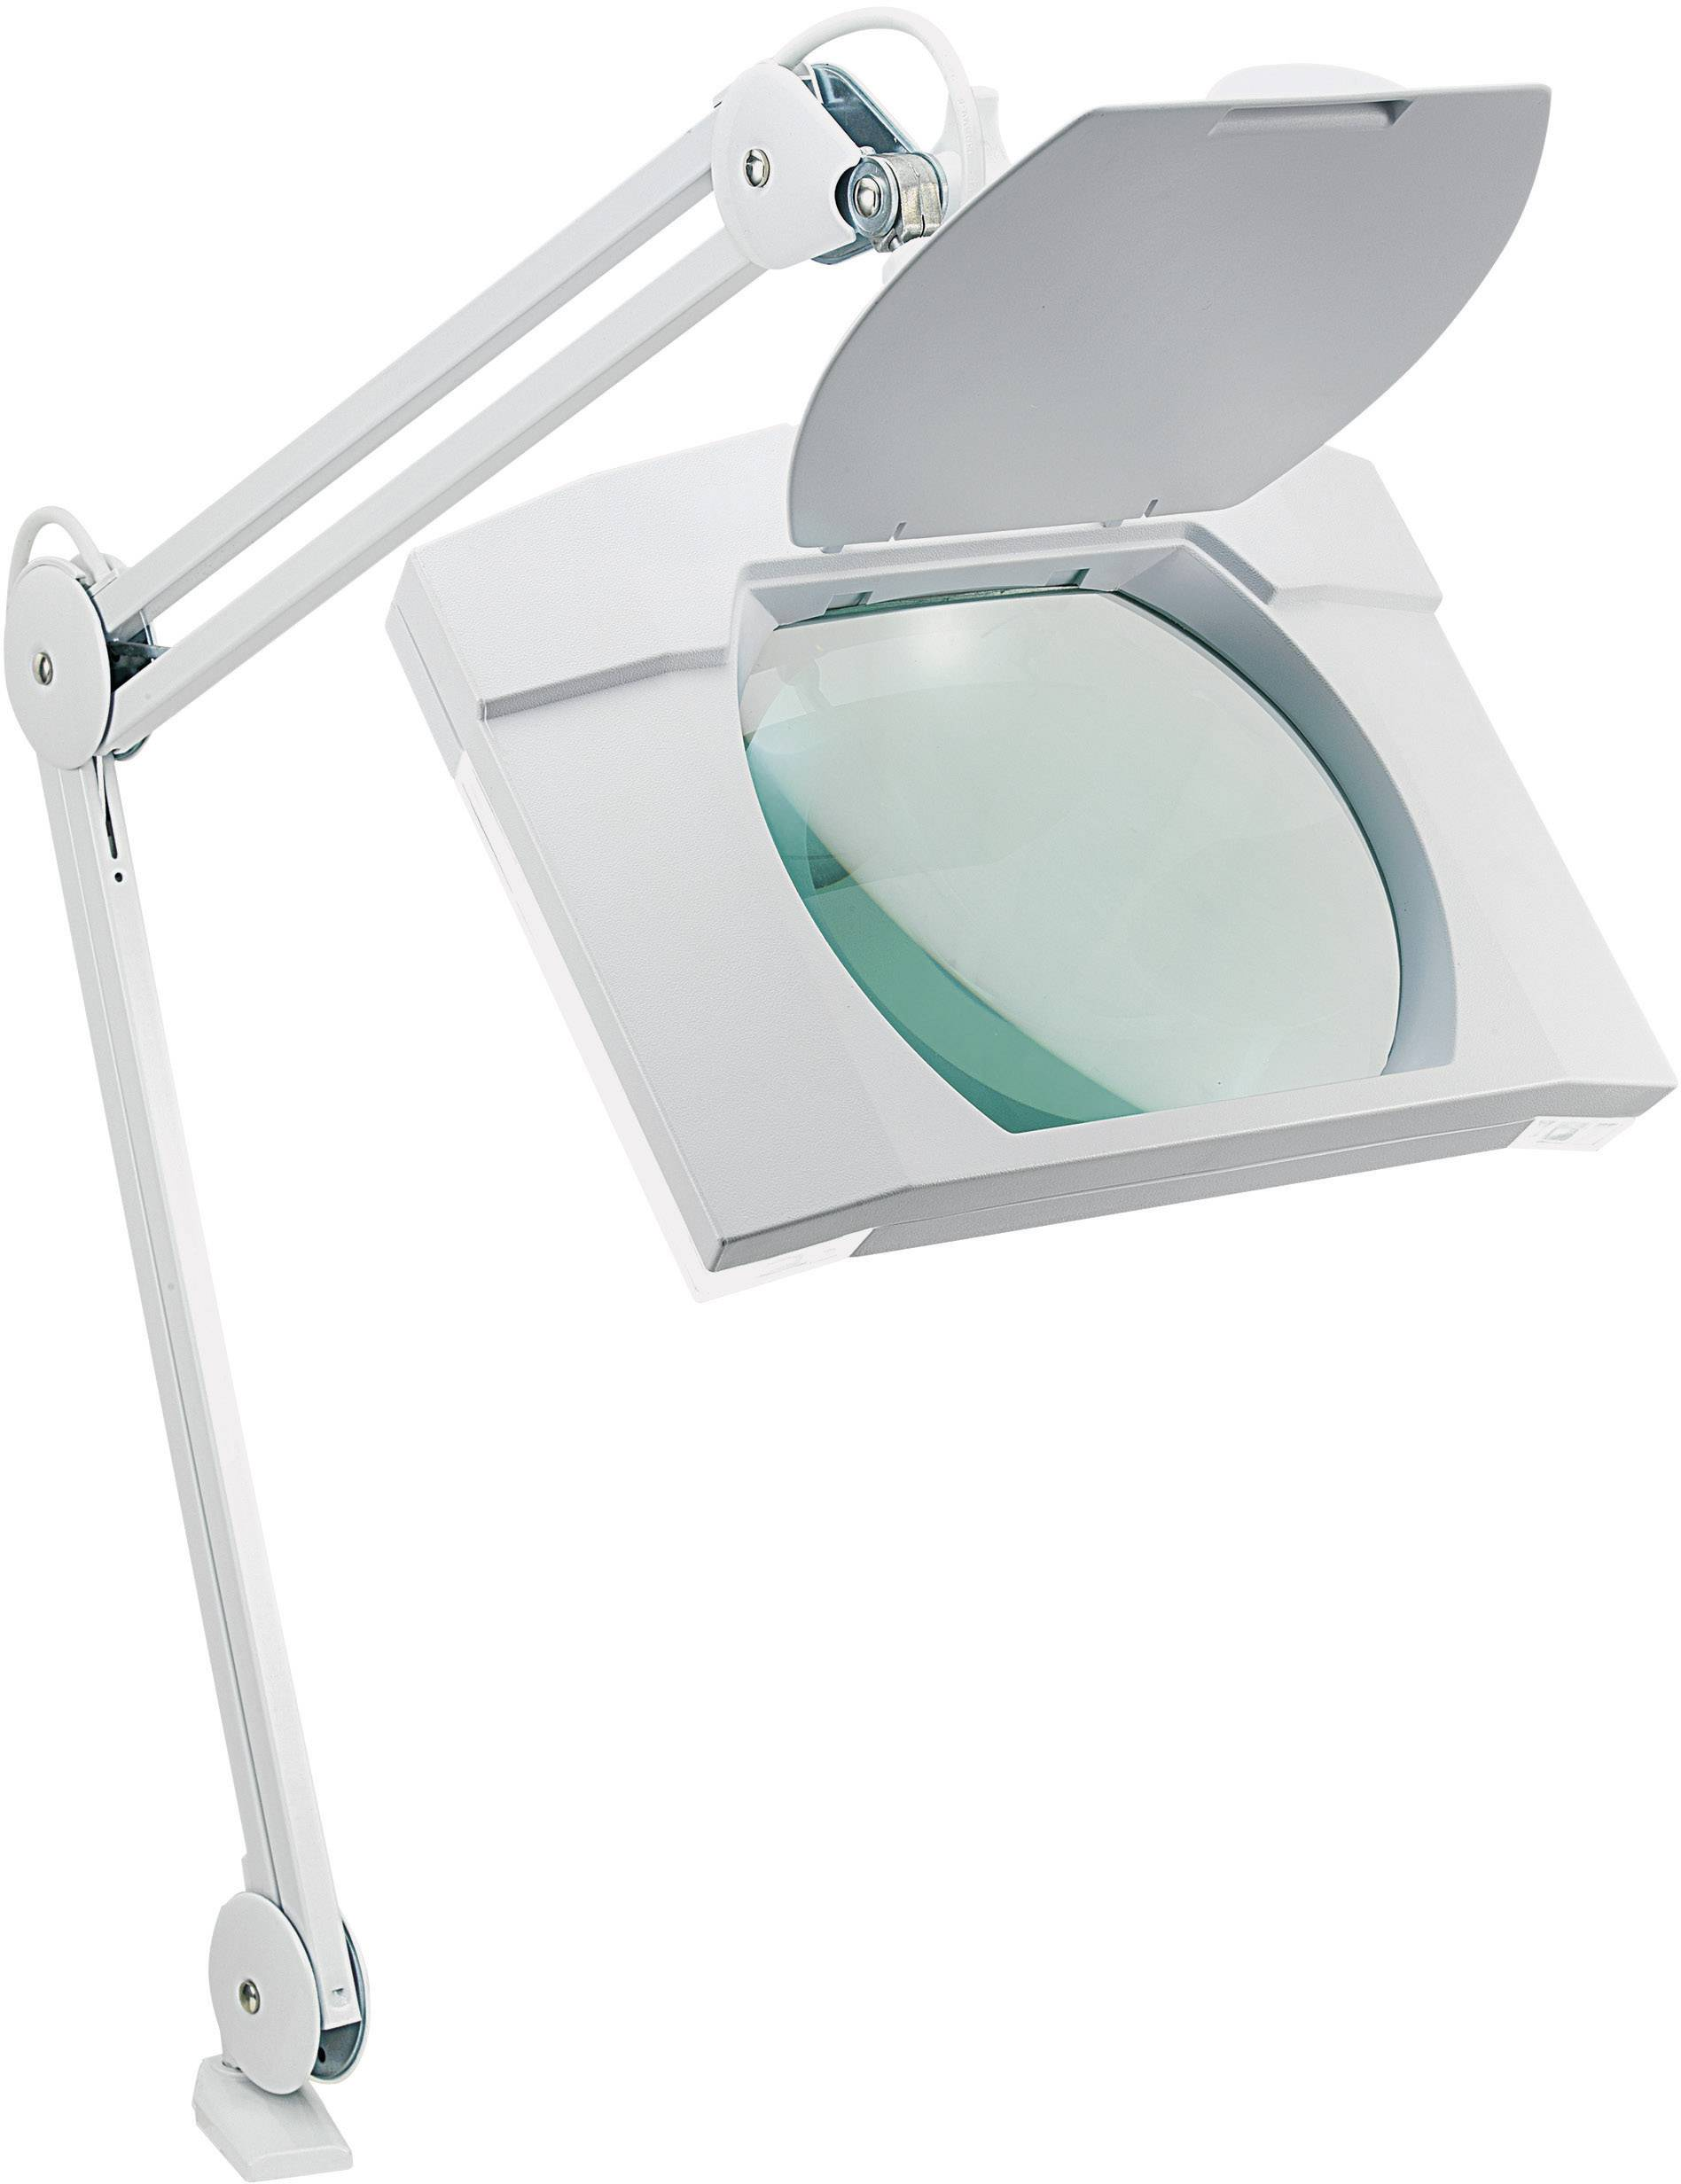 Stolná lupa s osvetlením TOOLCRAFT, 2x 9 W, 3D